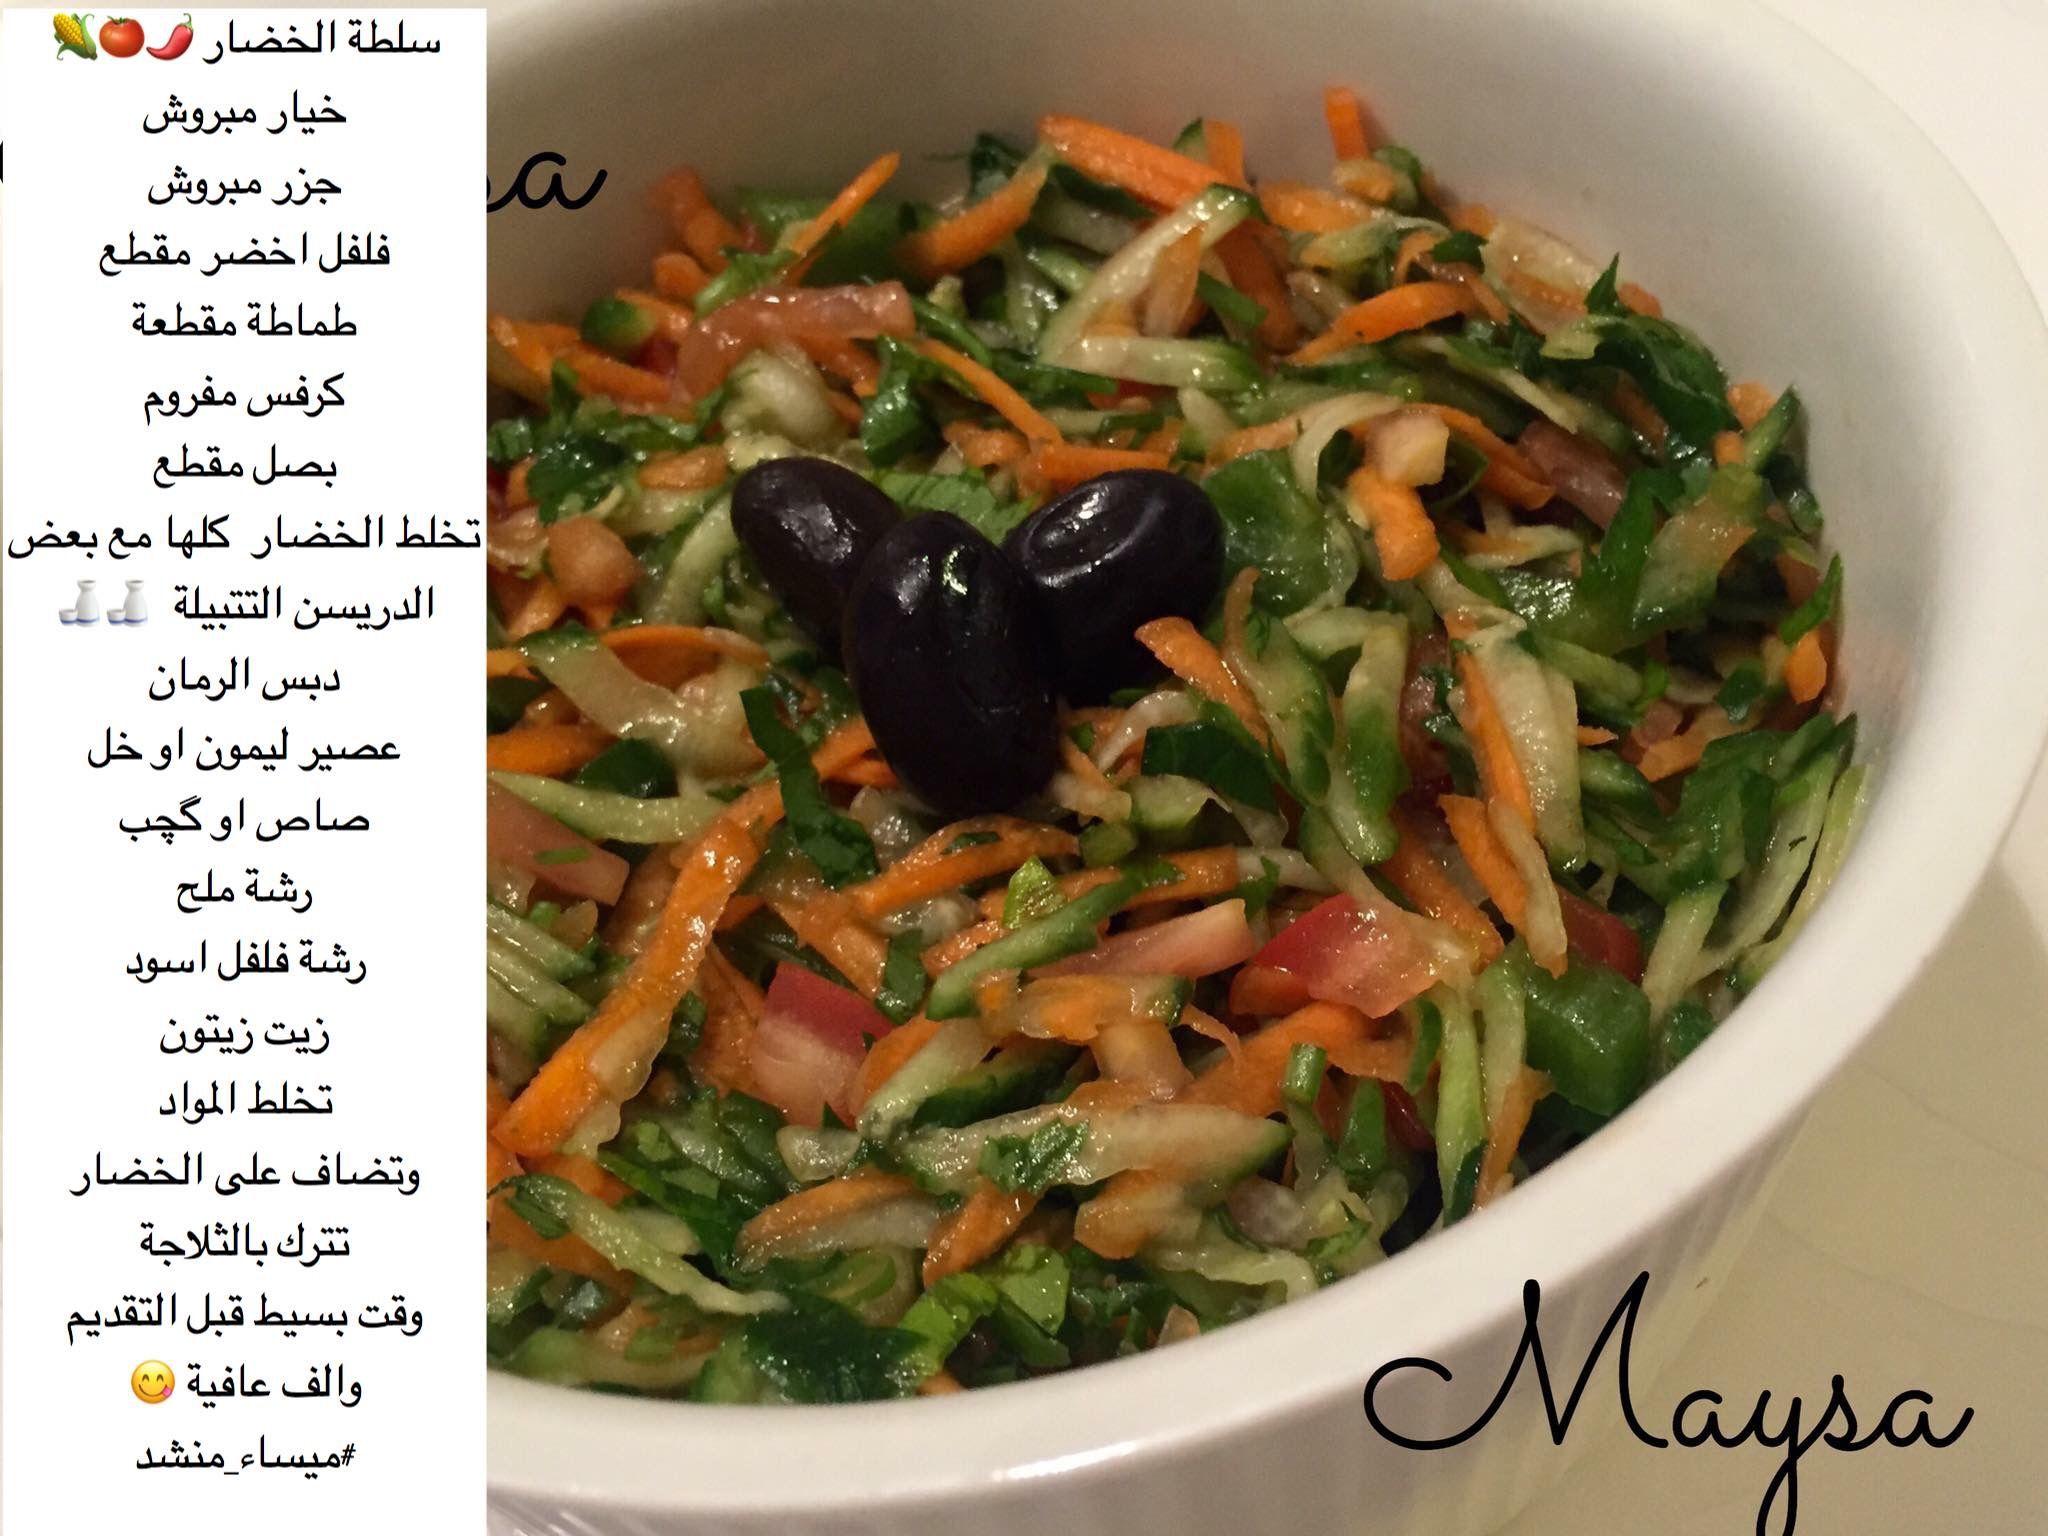 Pin By Asma M On F00d Arabic Food Food Healthy